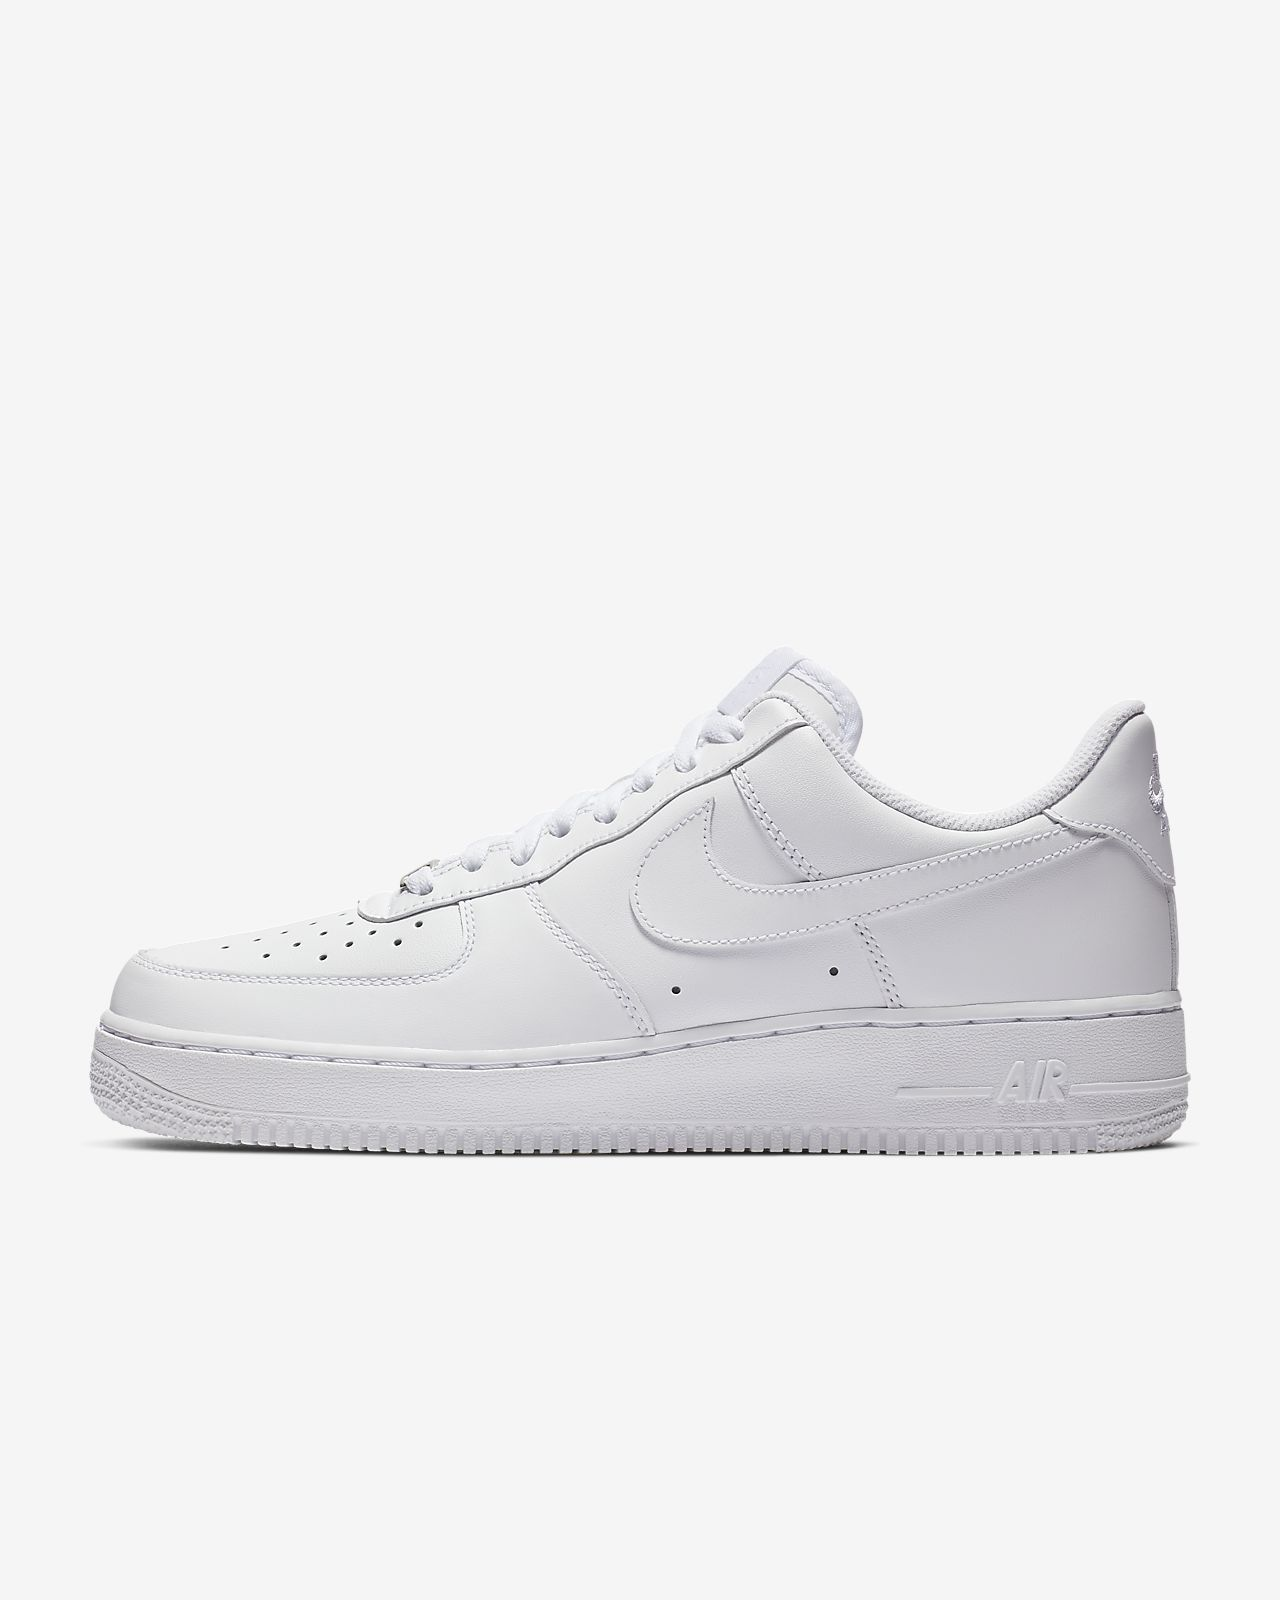 Nike Air Force 1 '07 Triple White Sabatilles - Dona